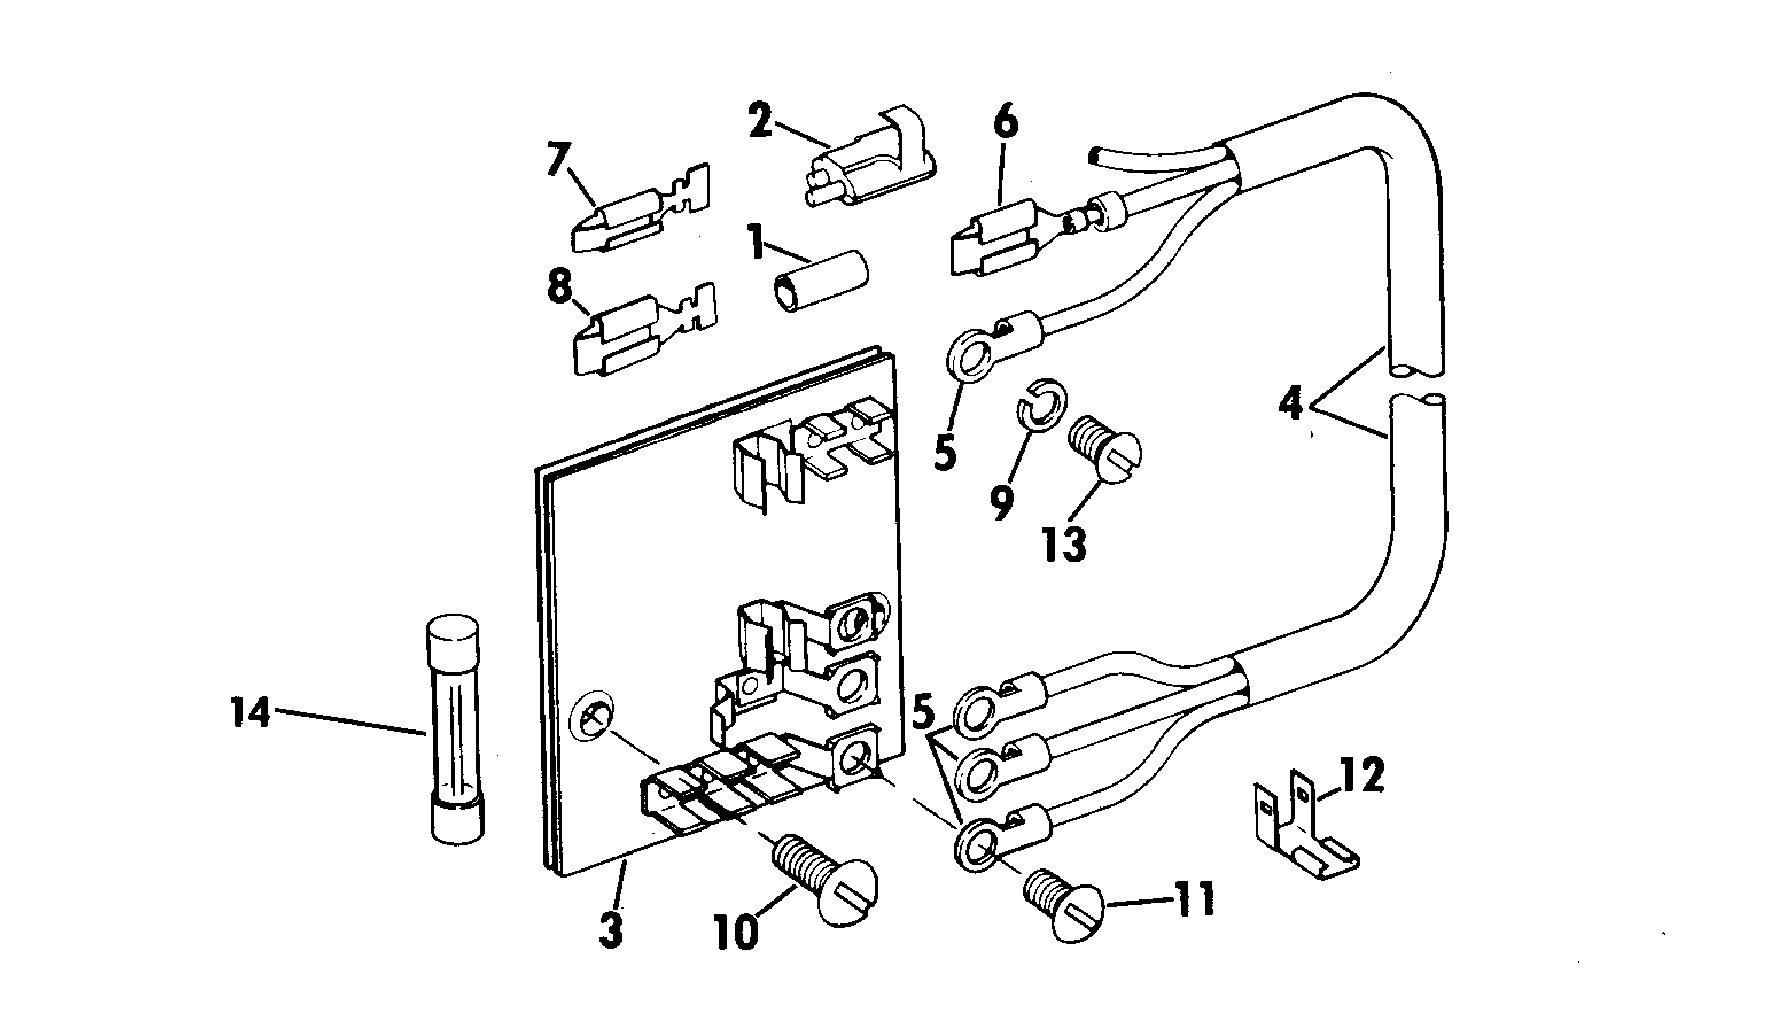 35 Johnson Outboard Control Box Diagram - Wiring Diagram List